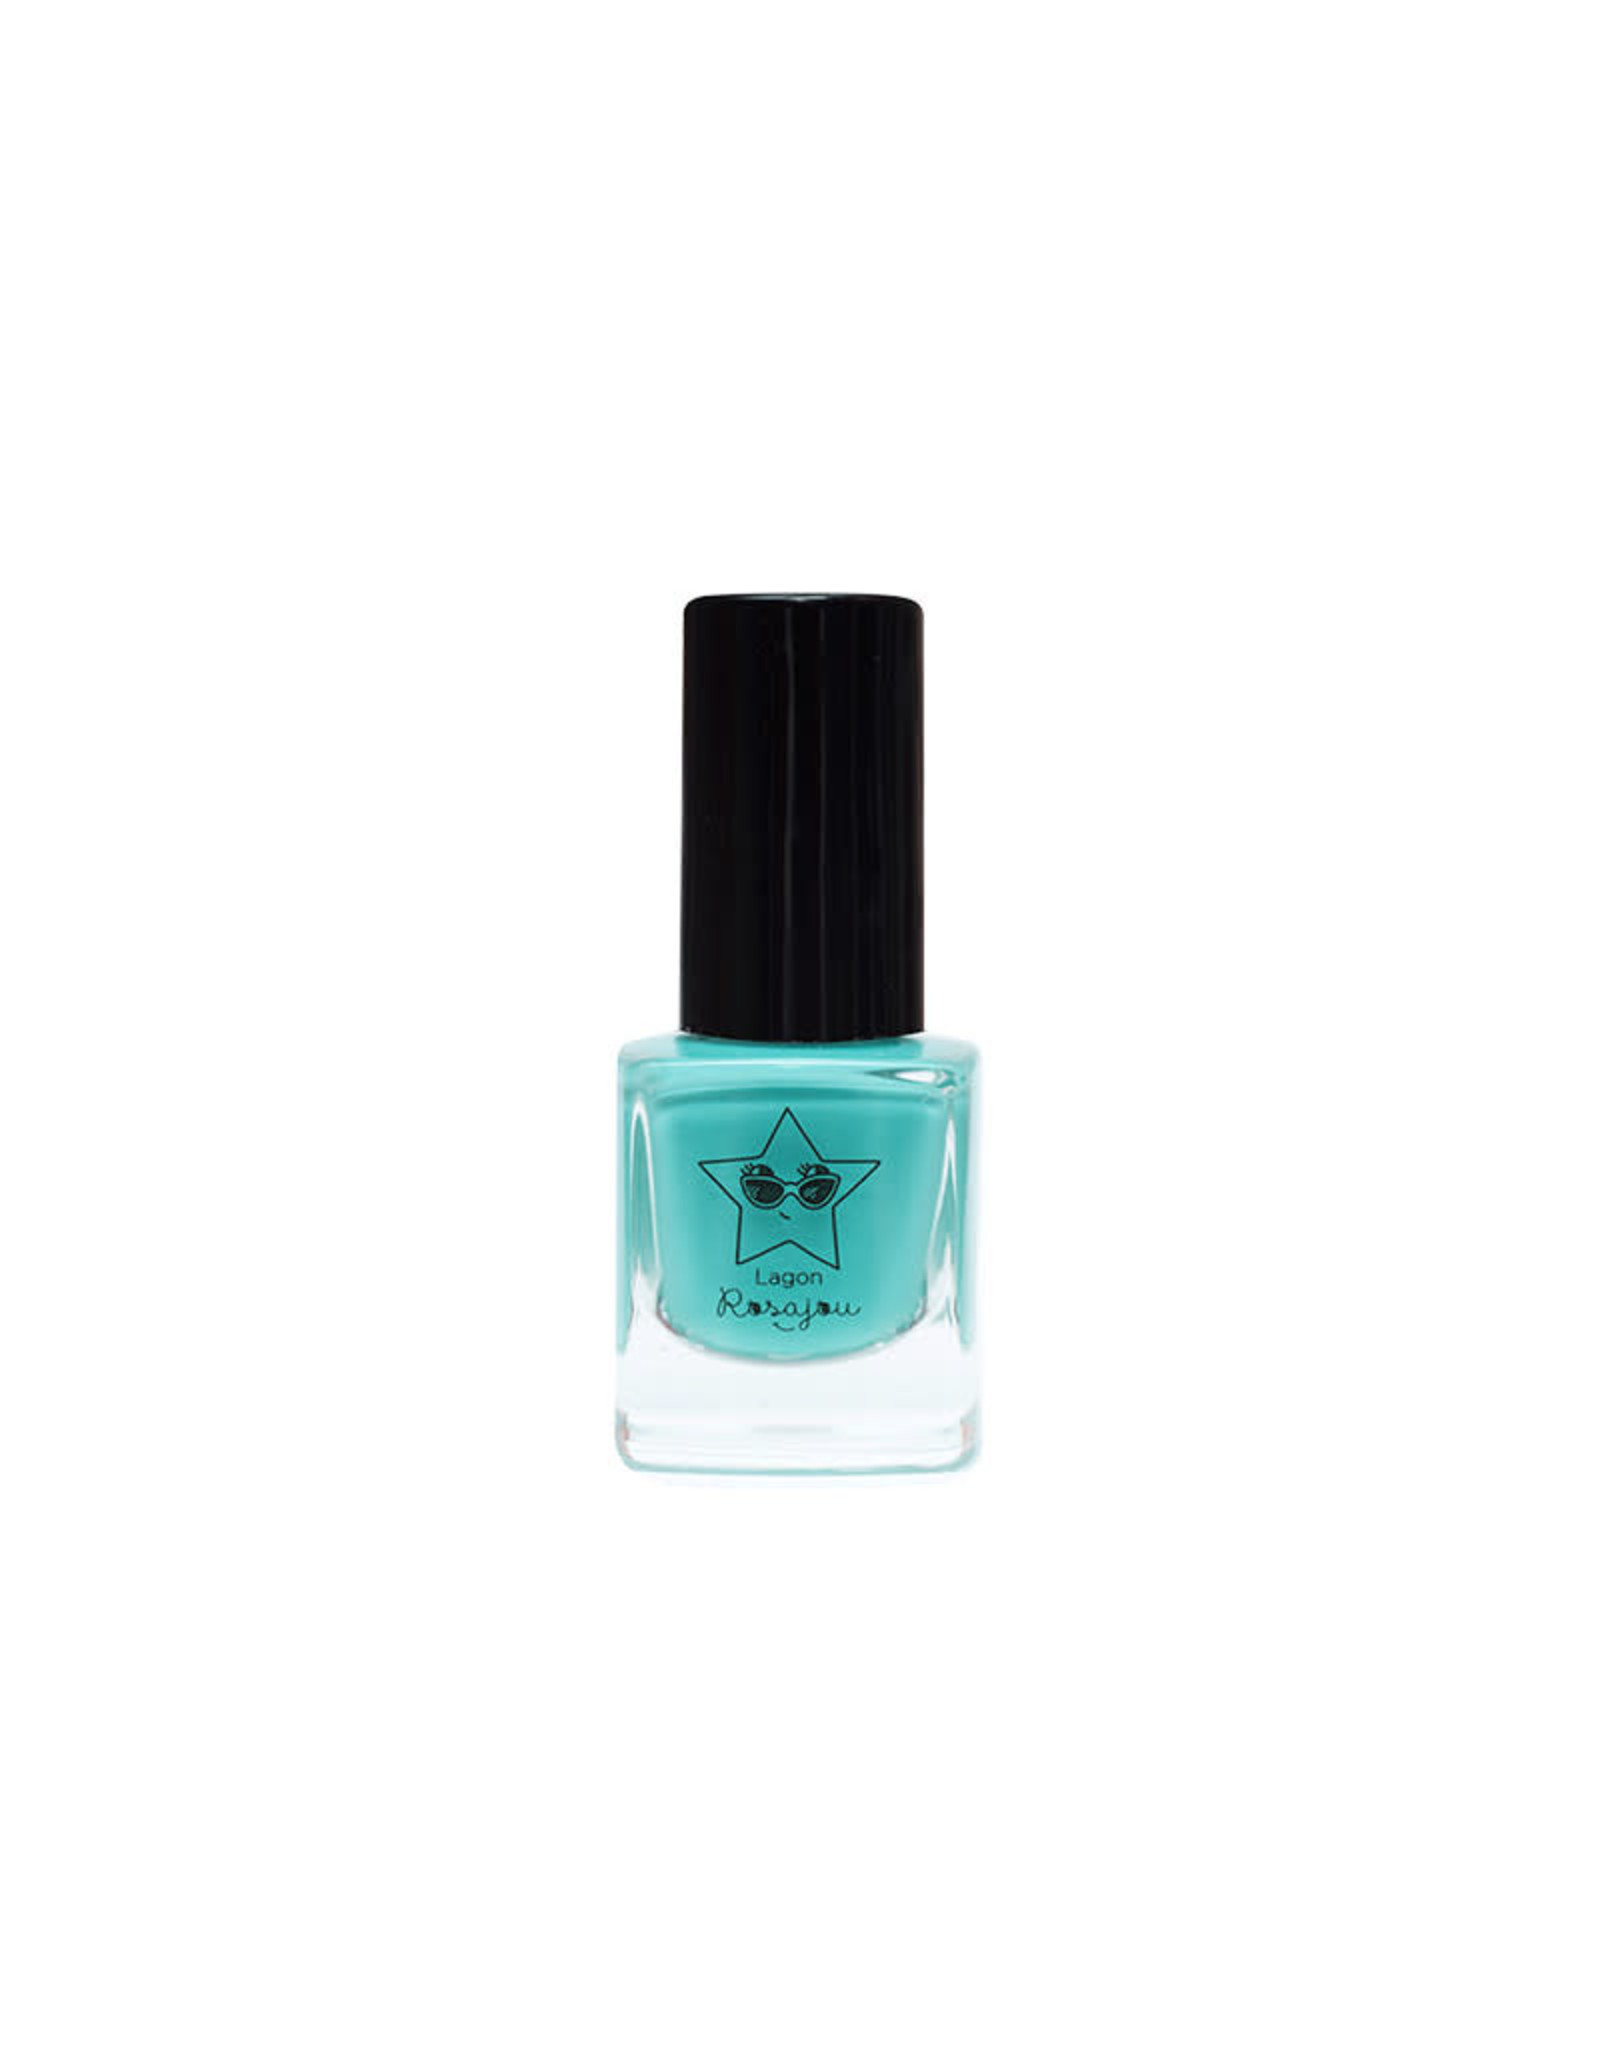 Rosajou nail polish 'Lagon'